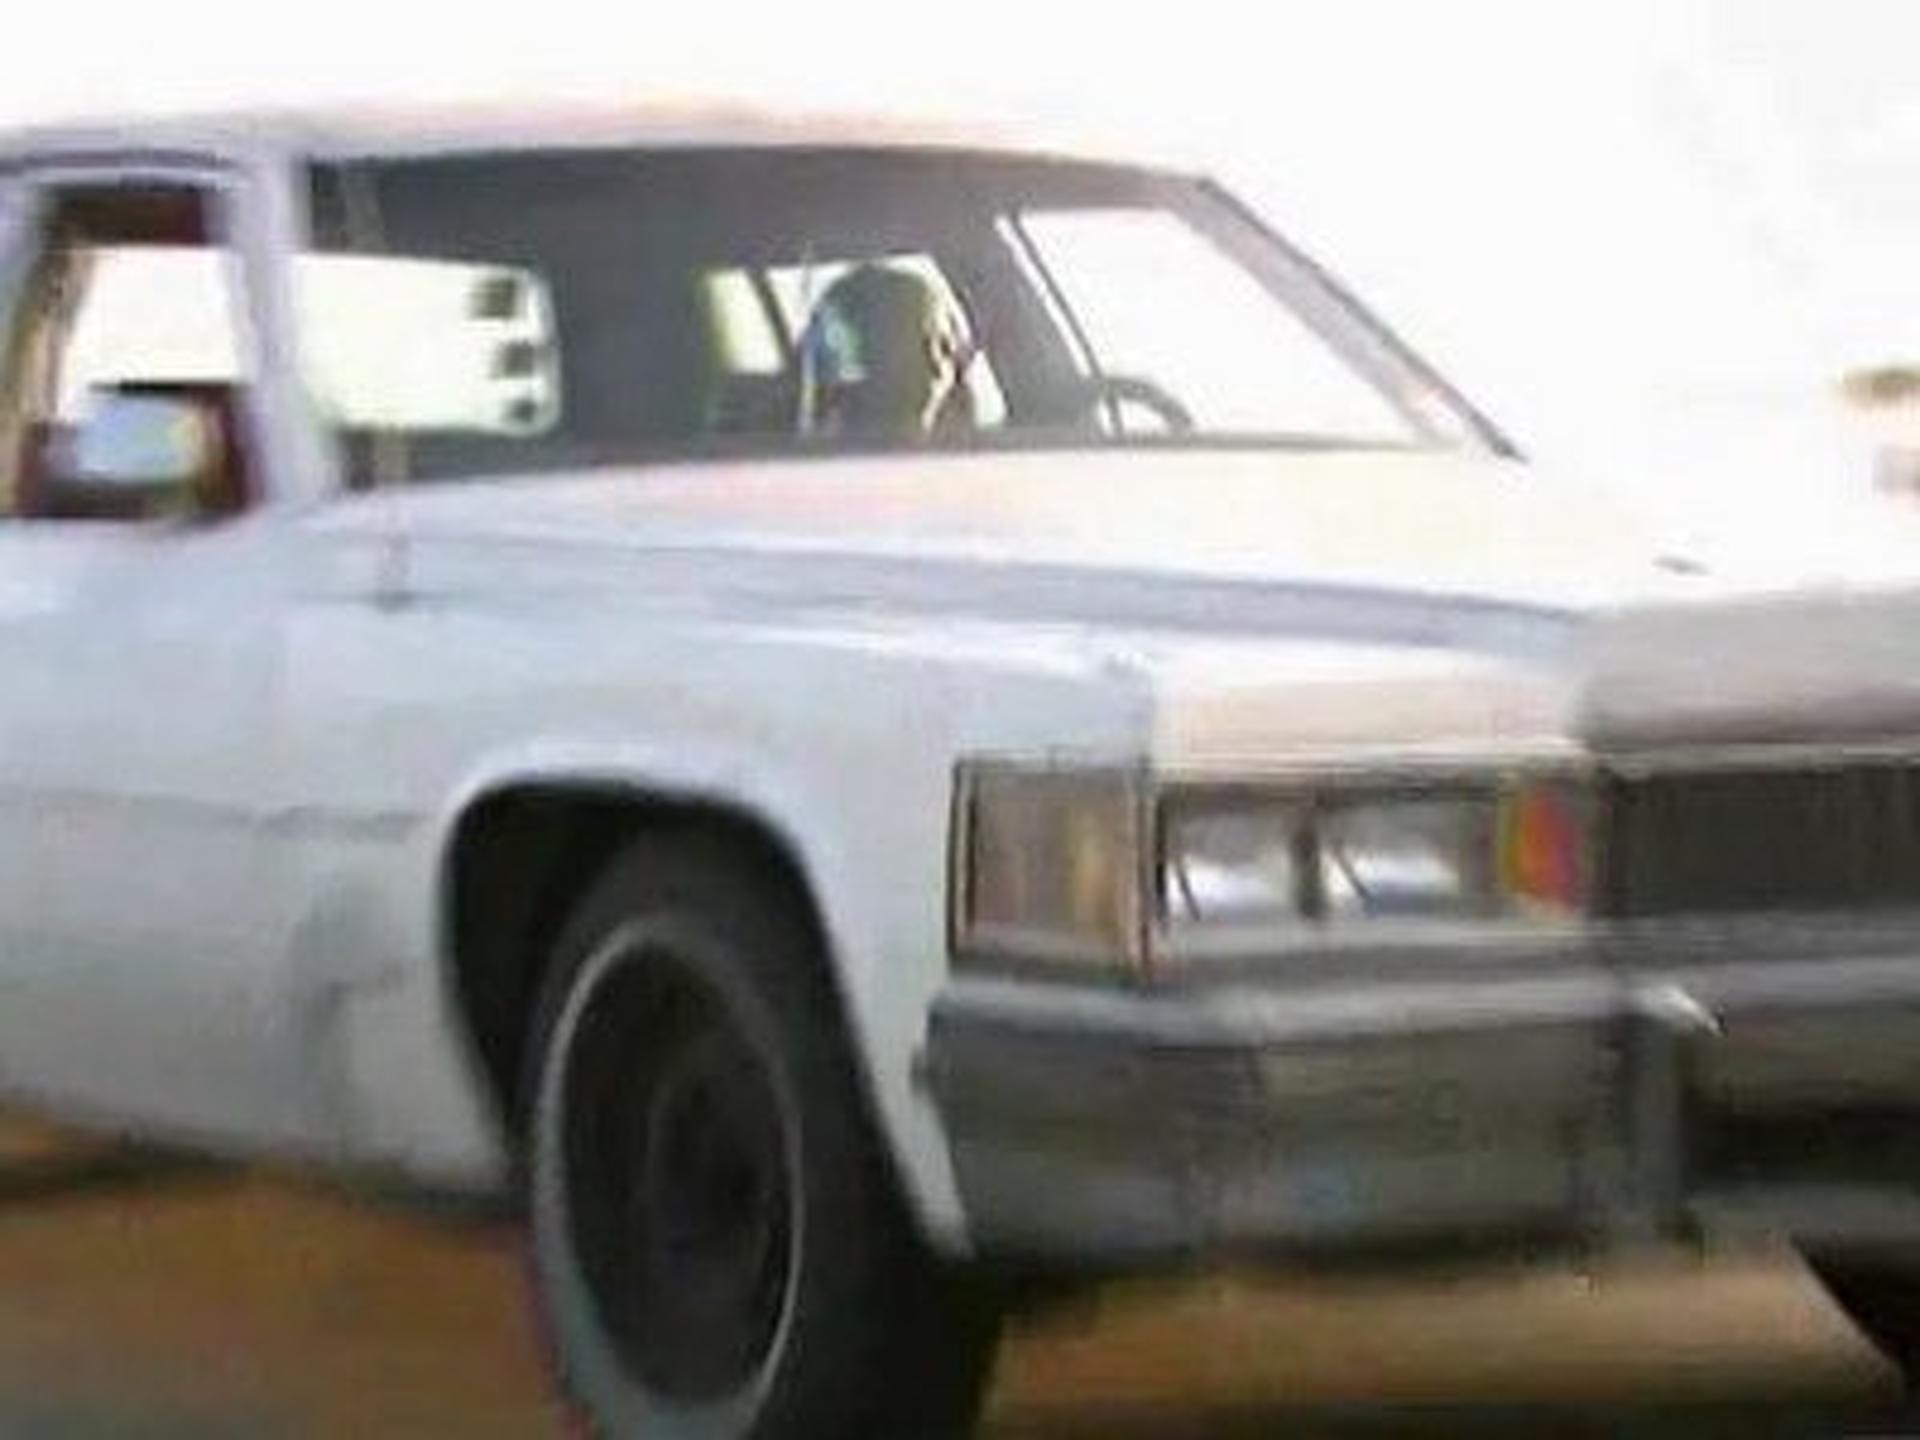 Niles Cadillac Sedan Deville Summary Pimp My Ride Season 1 1978 Interior Episode 2 Guide